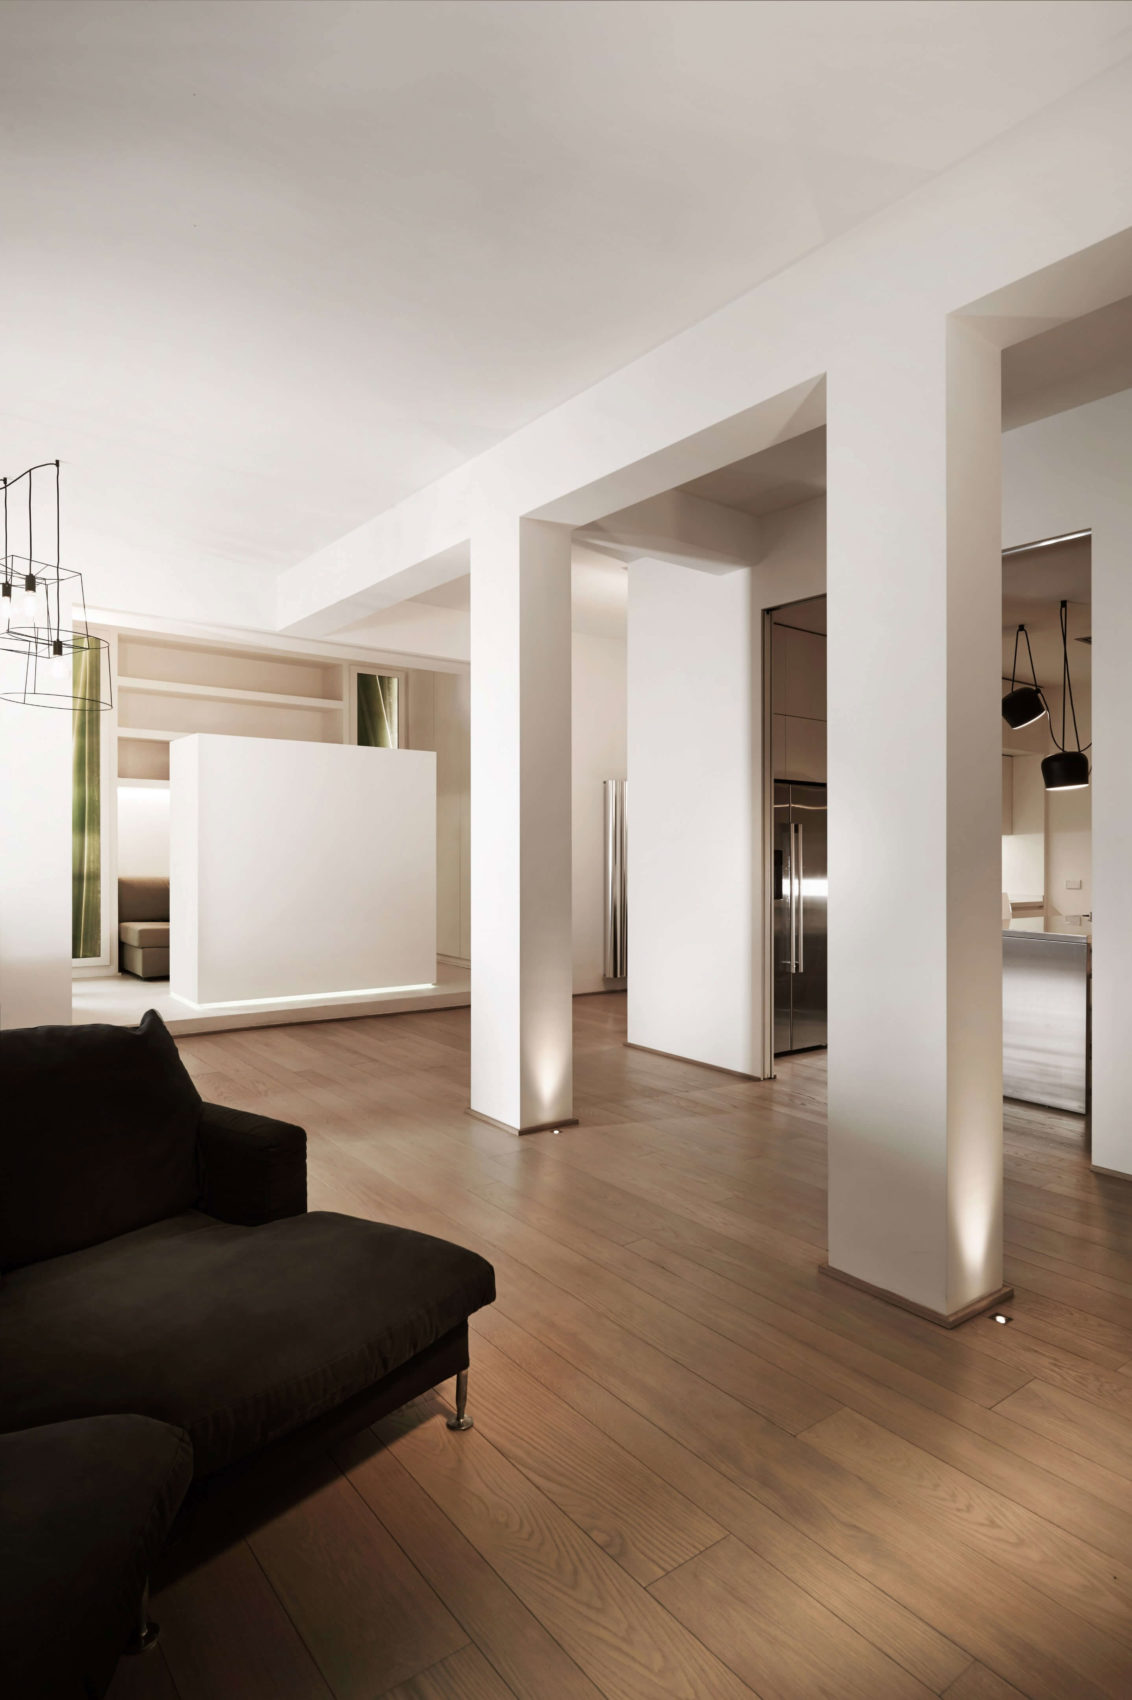 J Apartment by Carola Vannini Architecture (2)